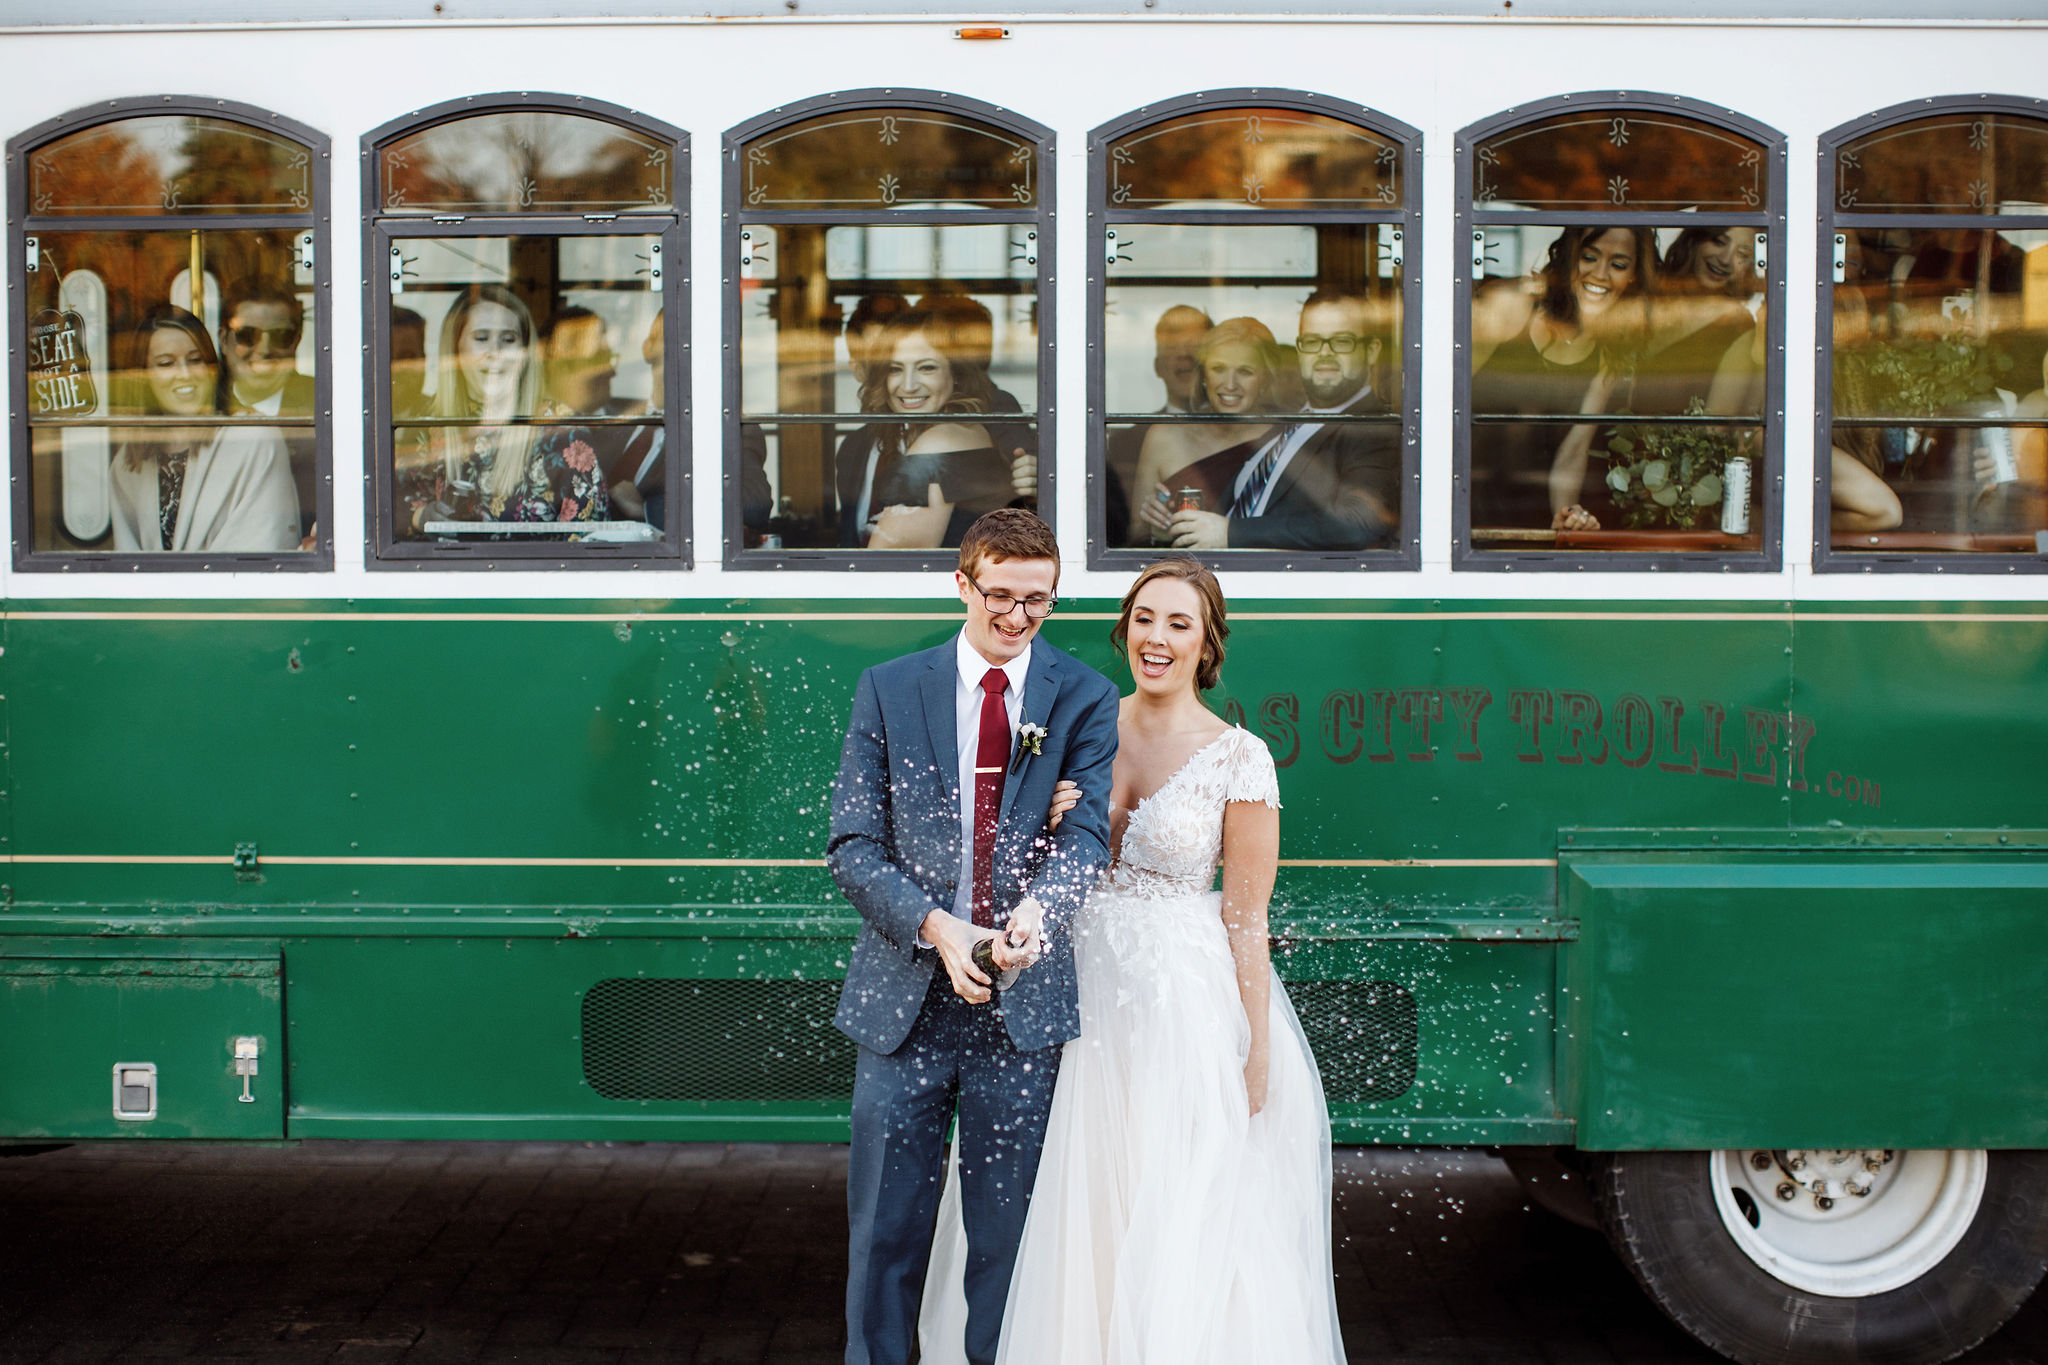 St. Francics Xavier and Madrid Theaater Wedding_Kindling Wedding Photography Kansas City_02.JPG